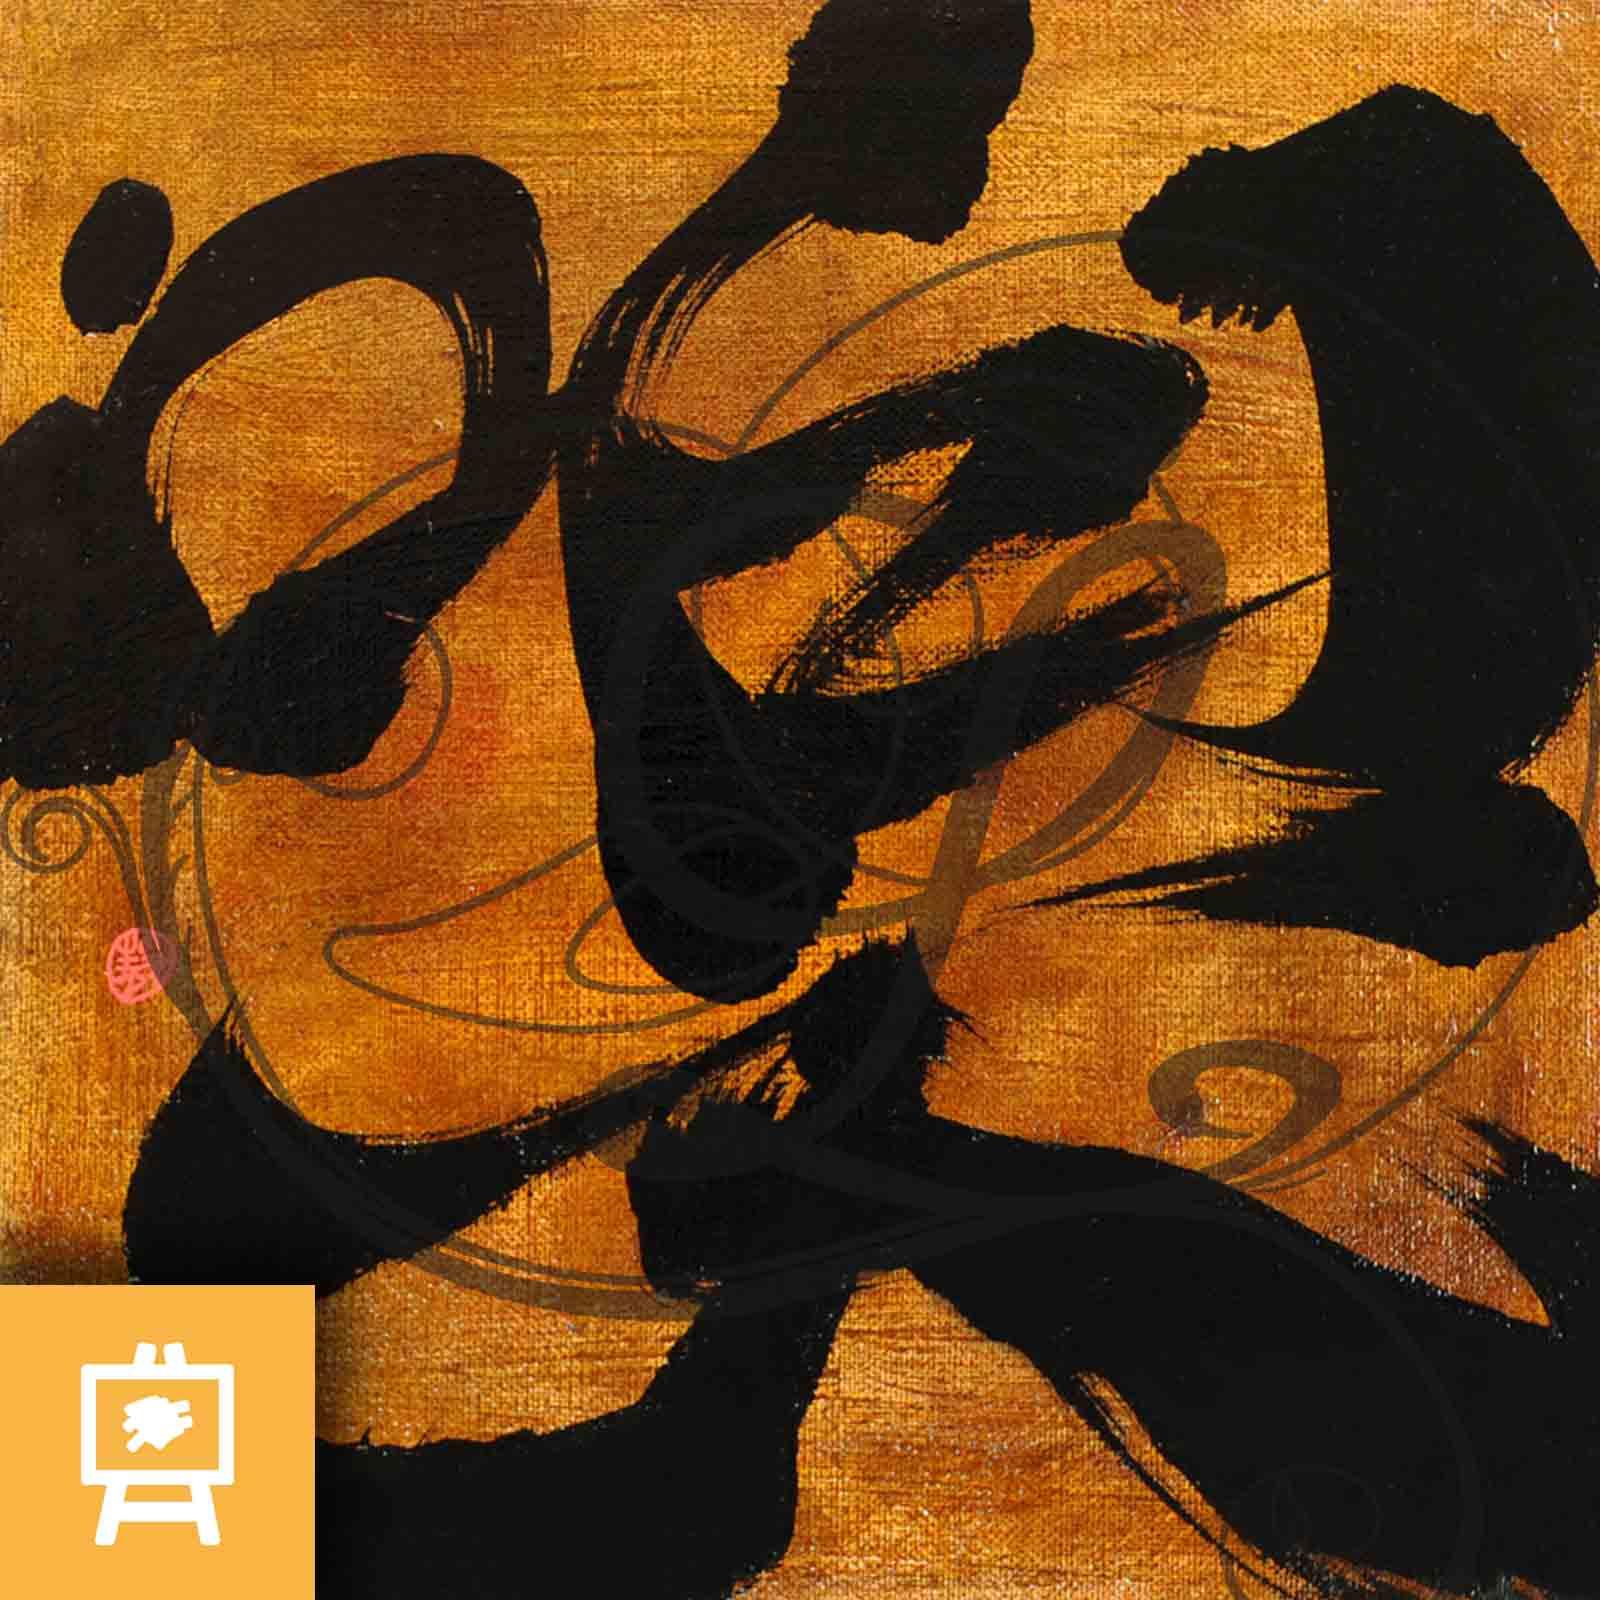 odorat-ching-yuan-legendart